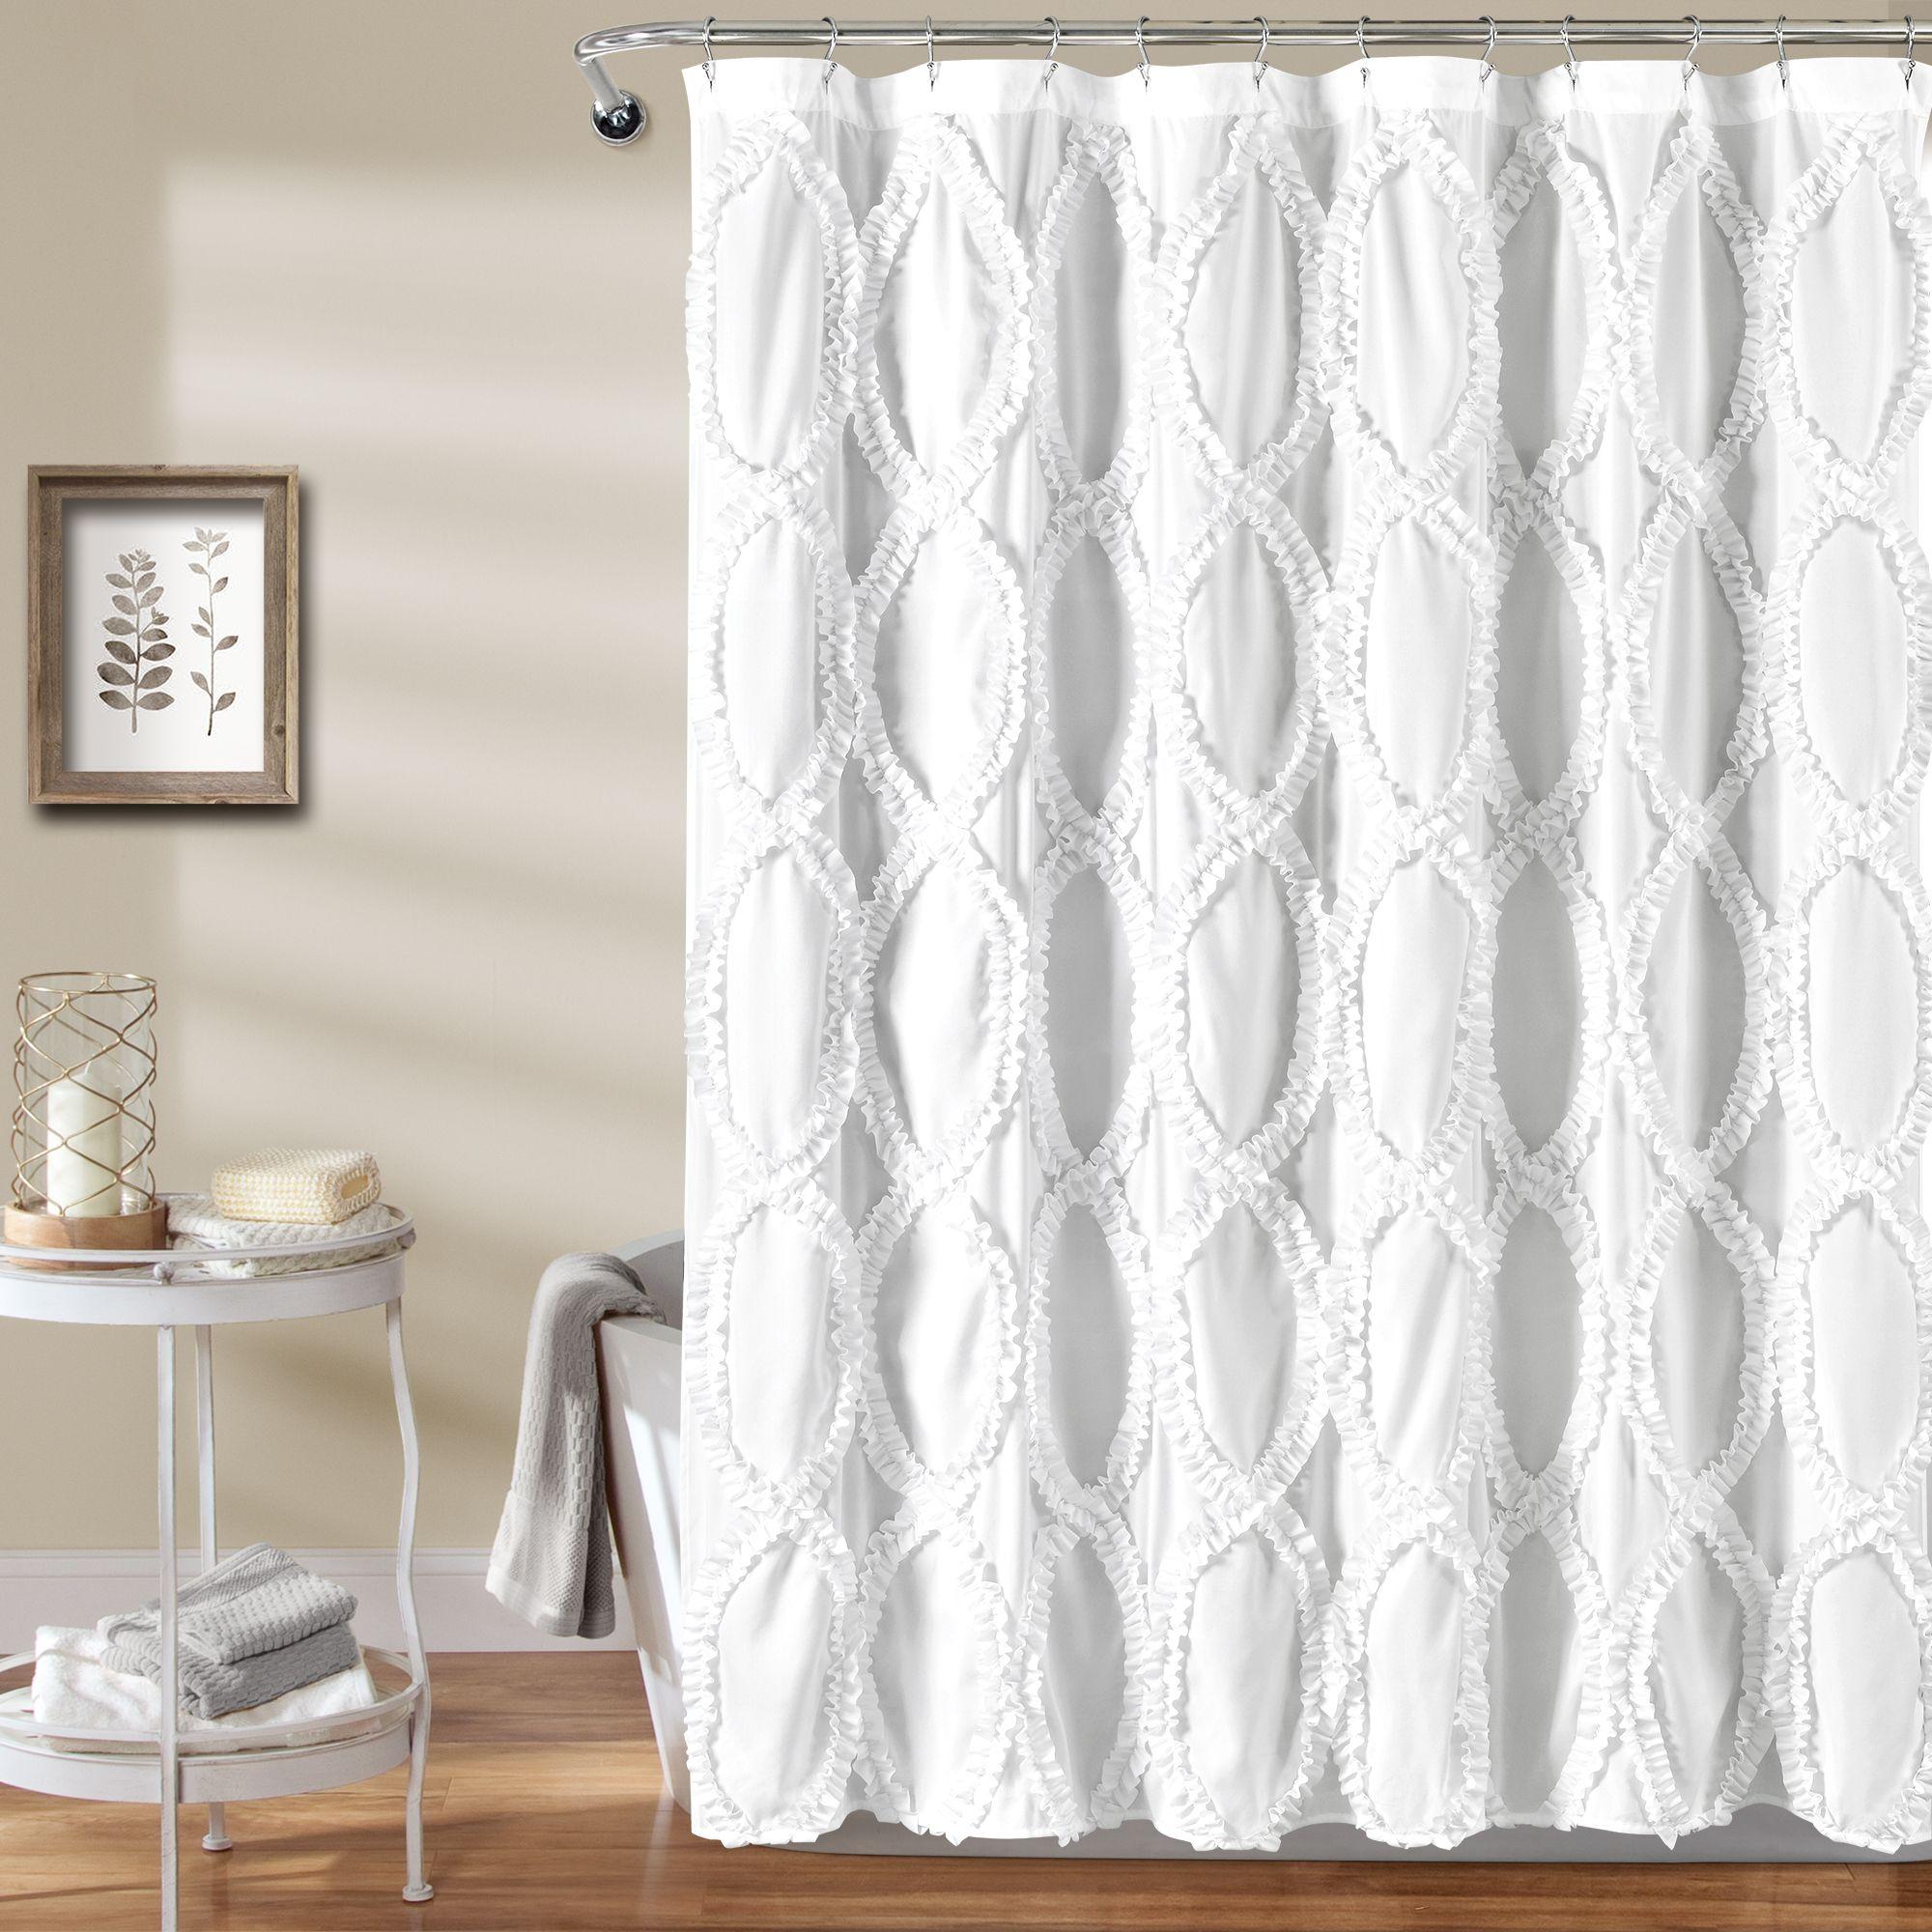 Avon Shower Curtain In 2020 Beautiful Curtains Curtains Shower